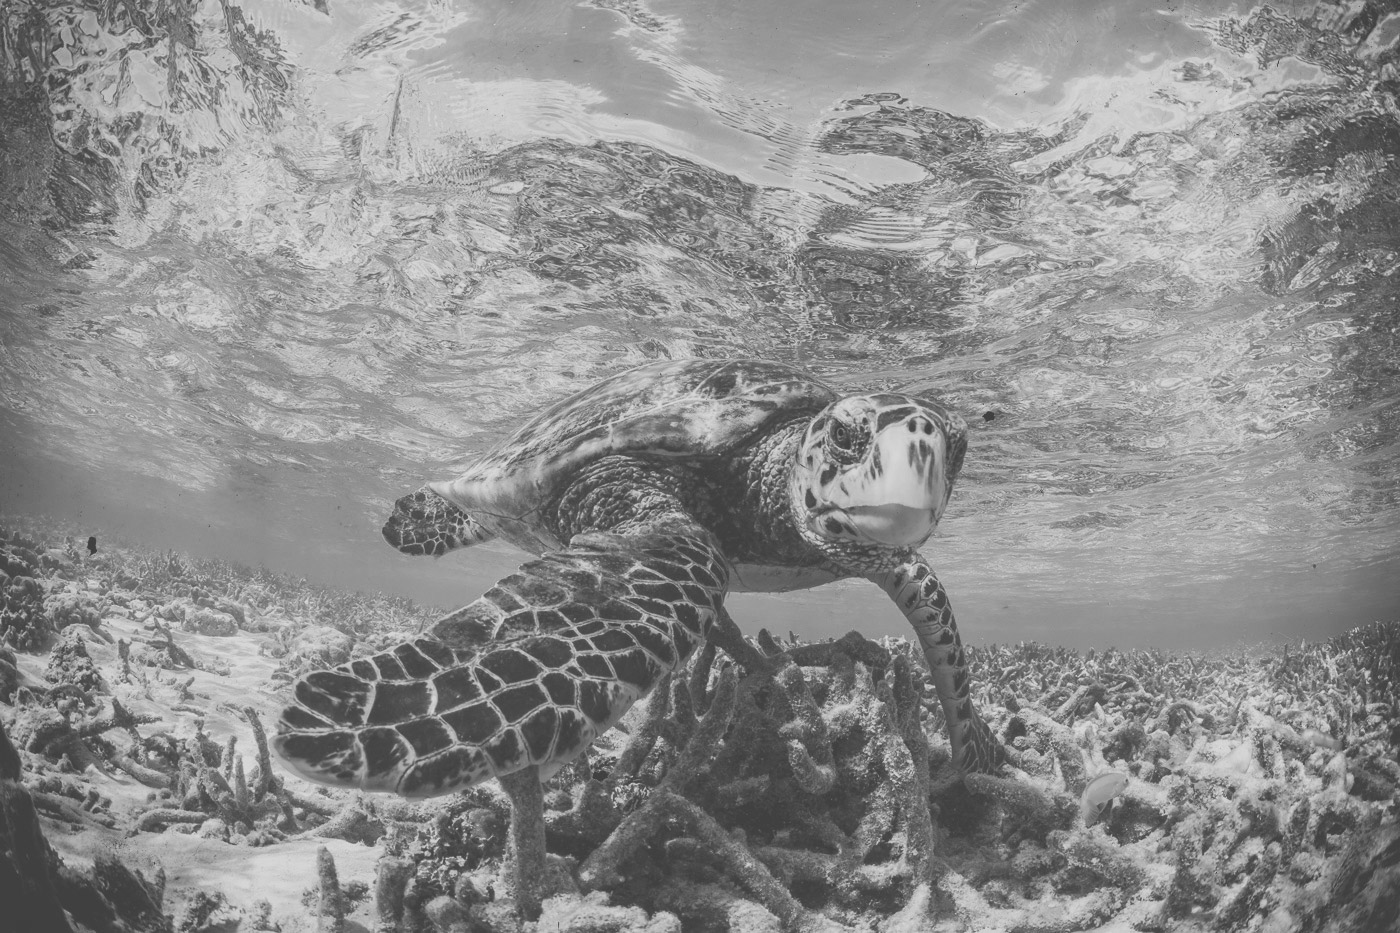 Meeresschildkröte am Riff des Soneva Fushi